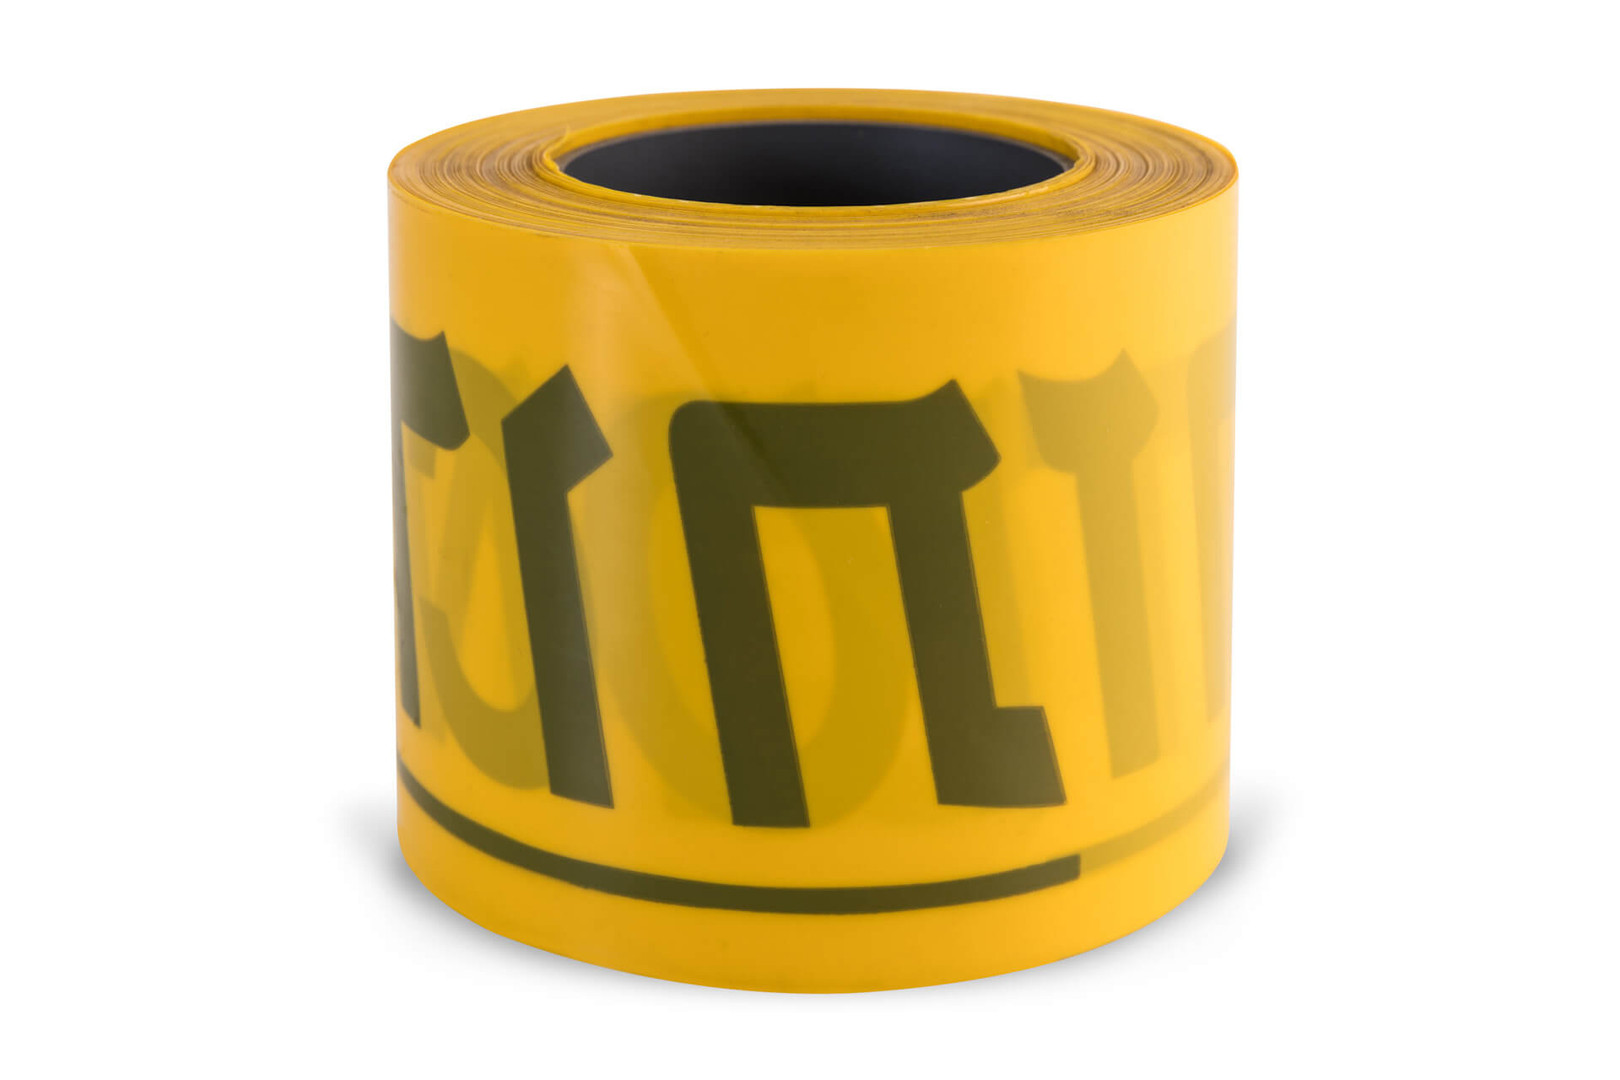 Caution sign tape